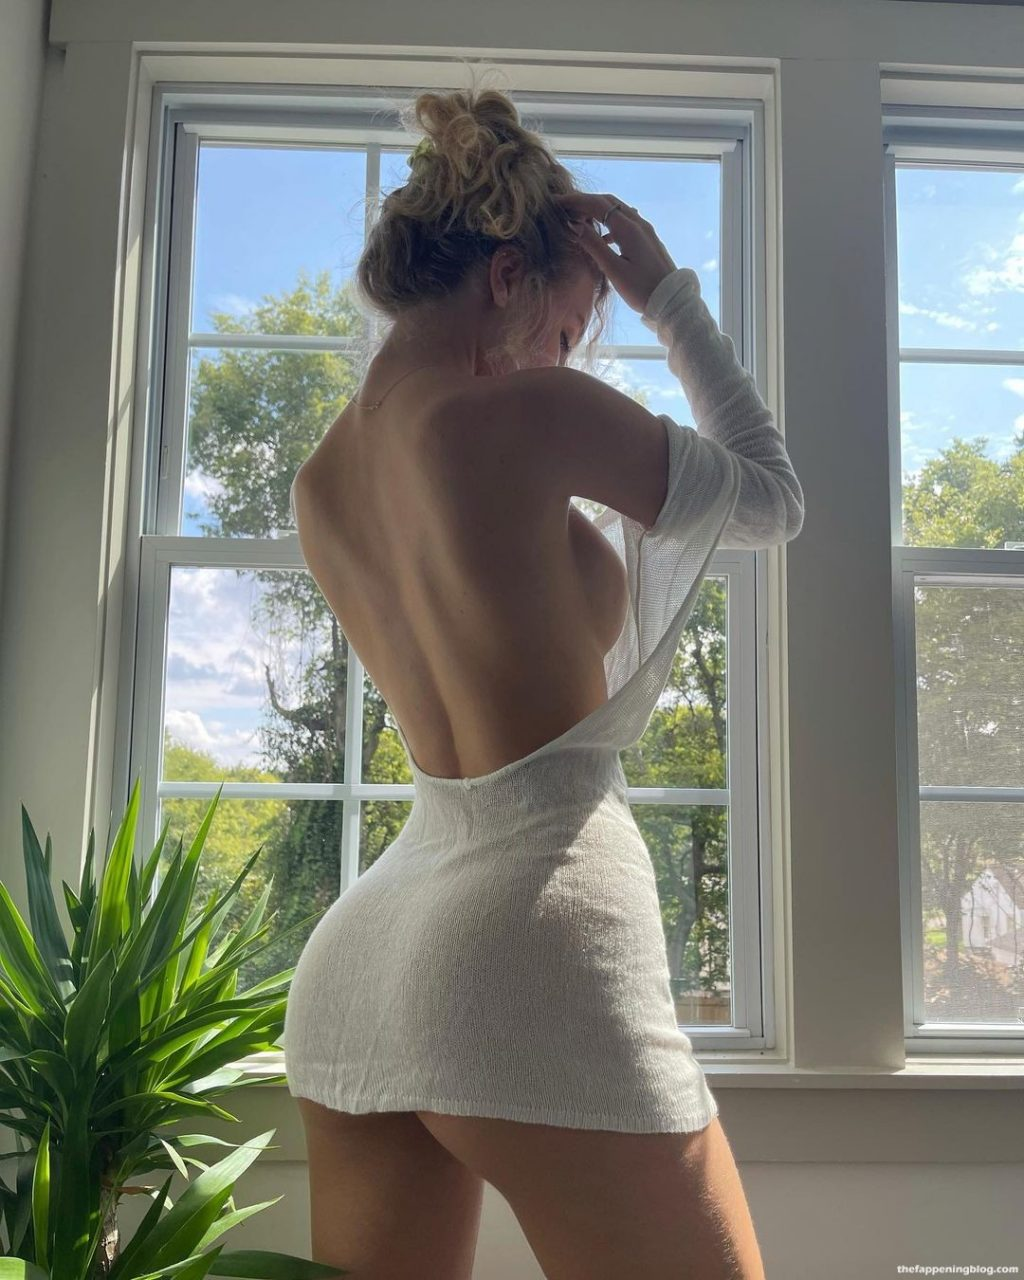 Daisy Keech Shows Off Her Sideboob (1 Photo)